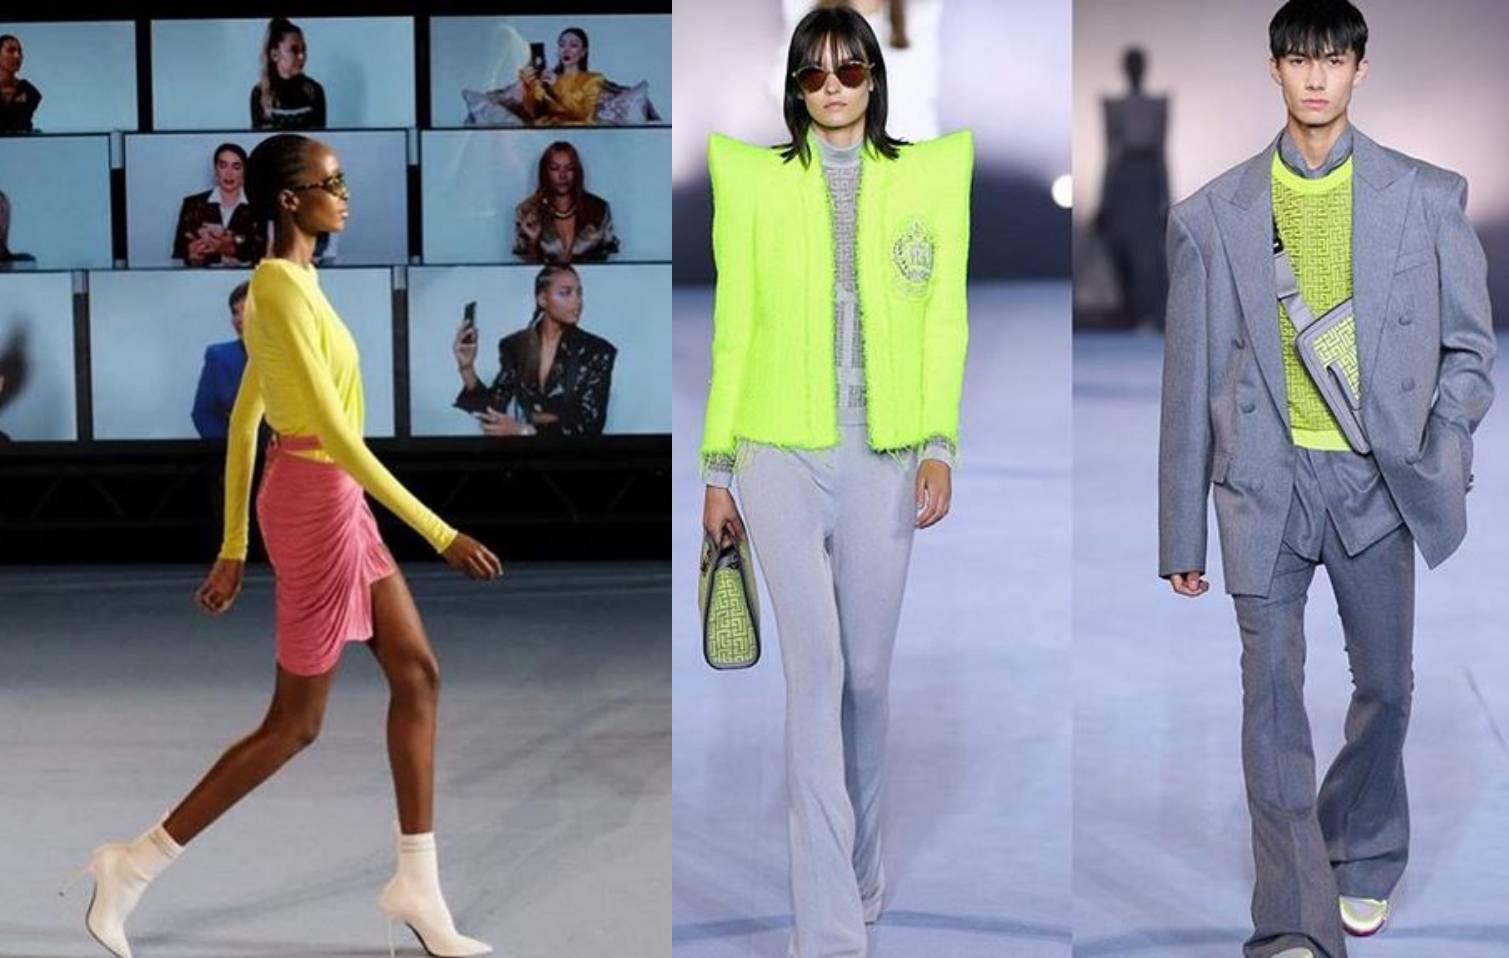 Ipak je ključna: Paris Fashion Week ističe snagu modne piste